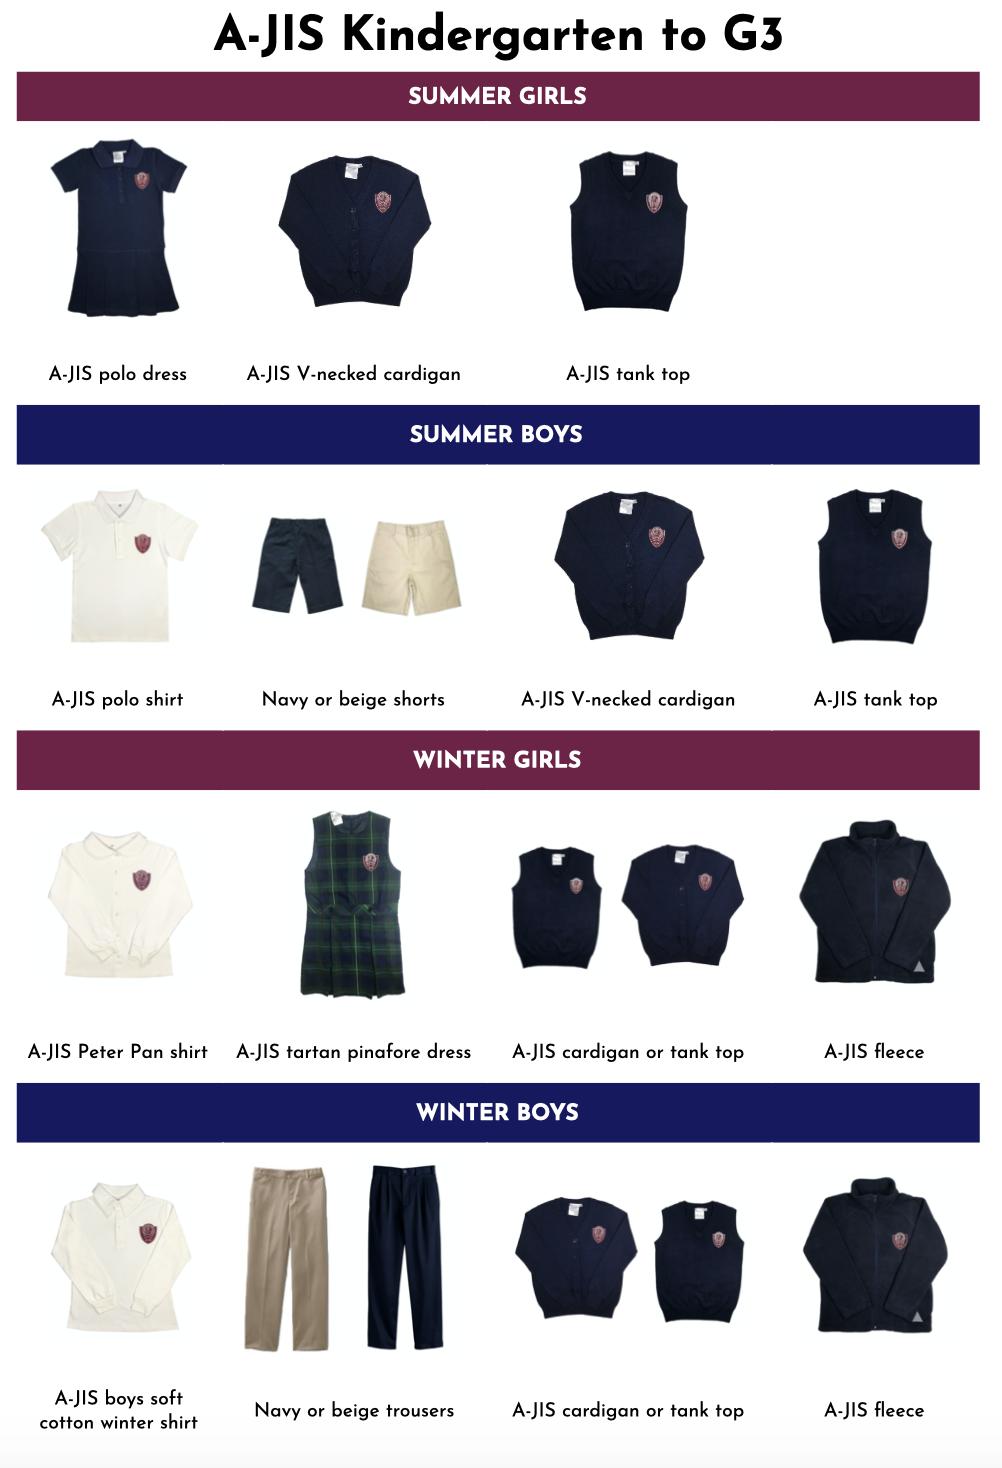 ajis-uniform-guide-2020-5.png